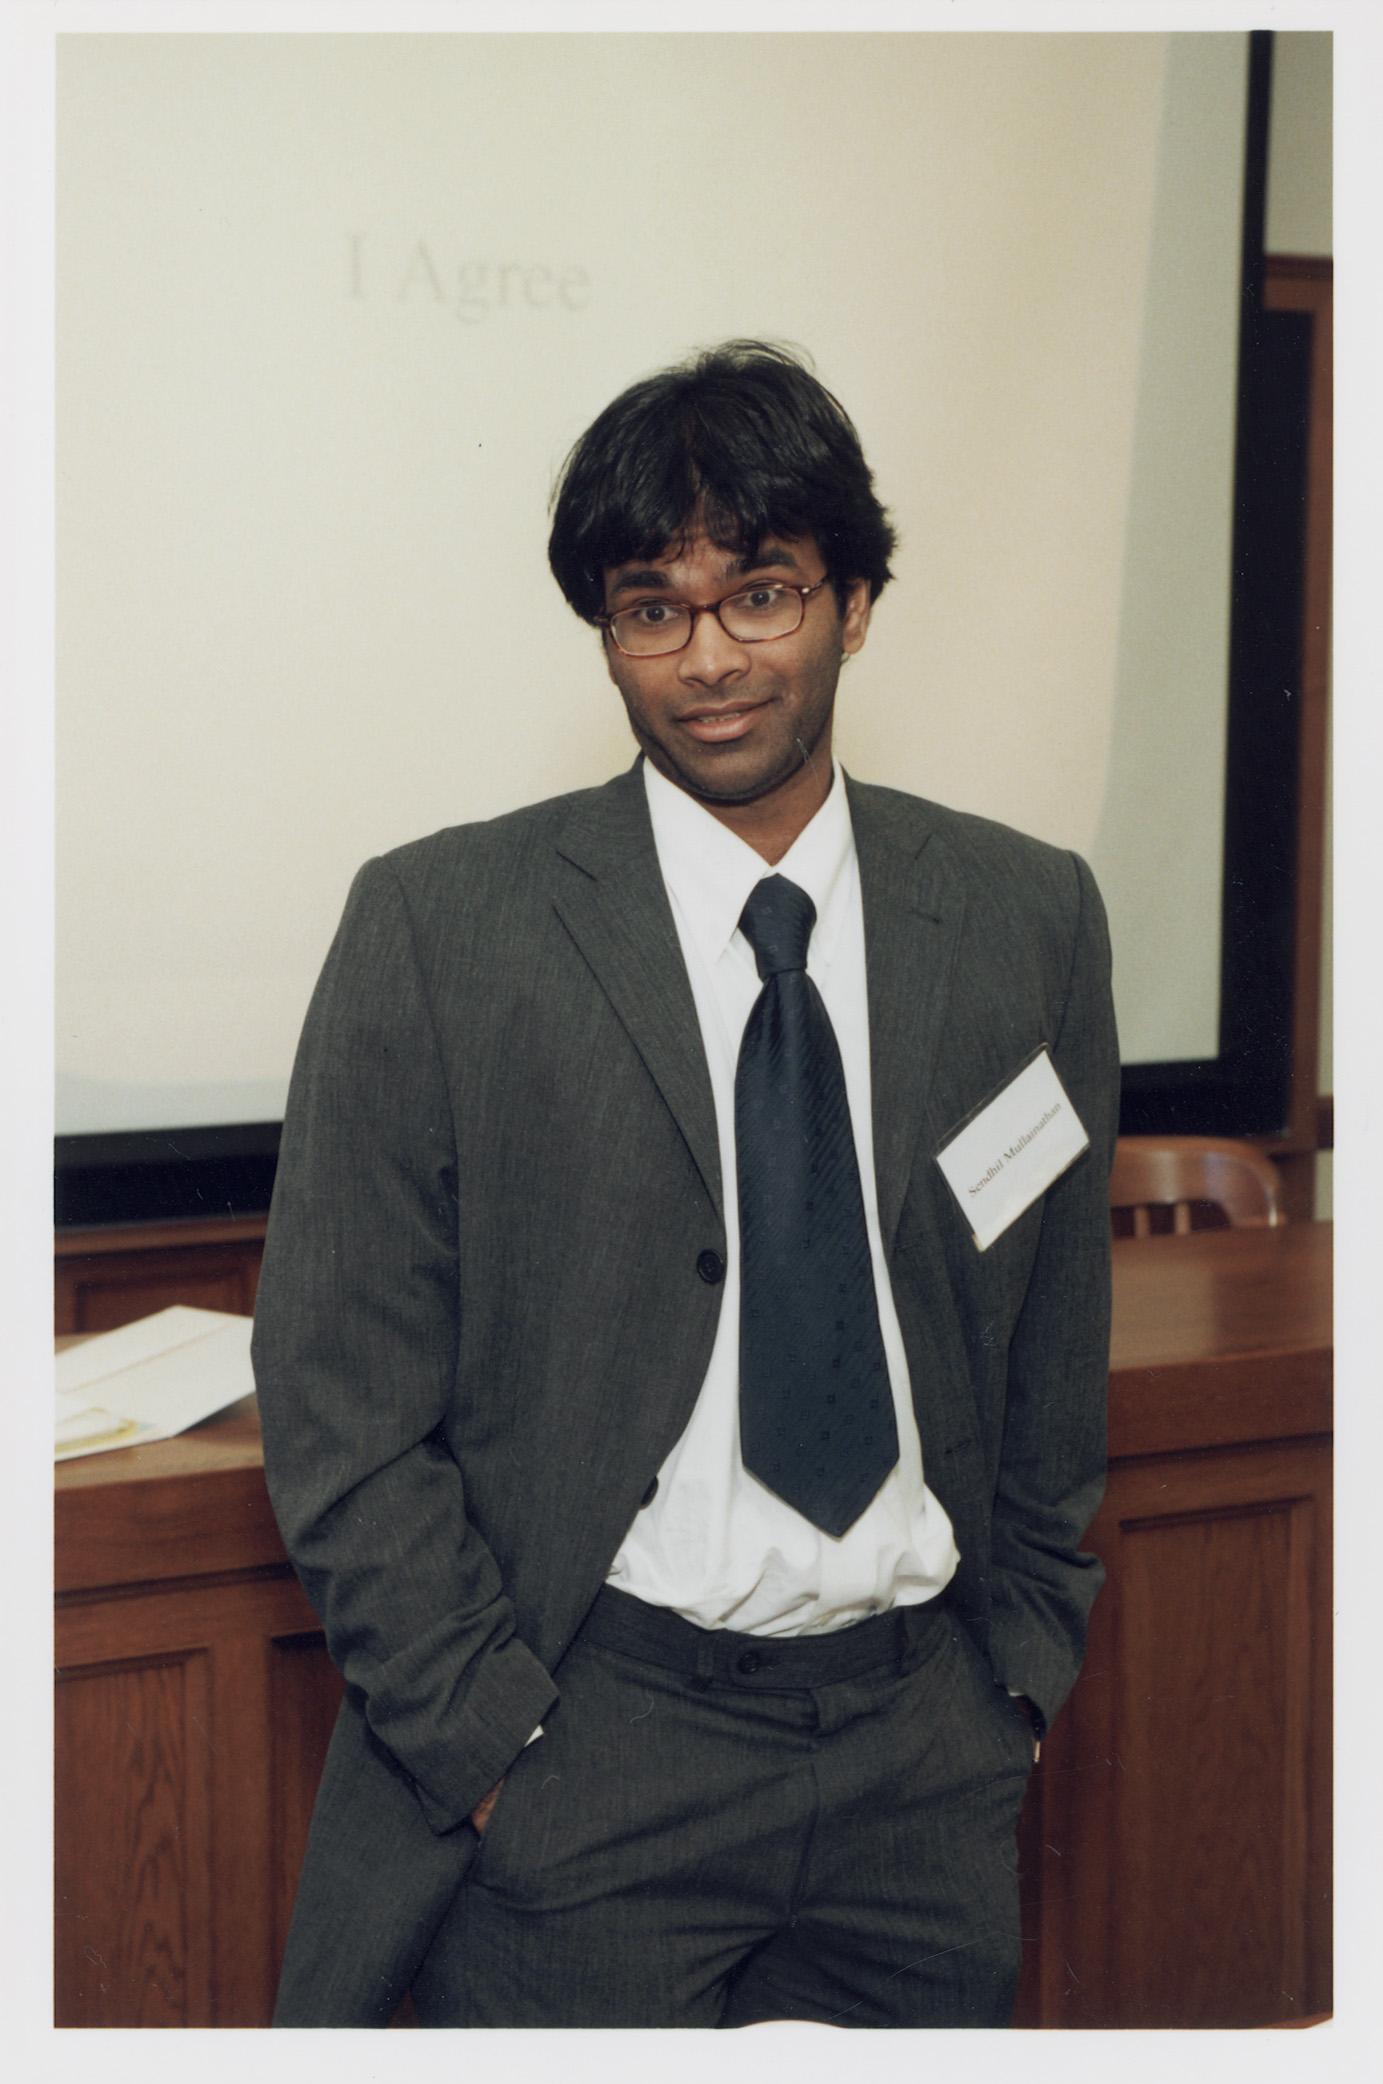 MIT Econ. Prof. Sendhil Mullainathan